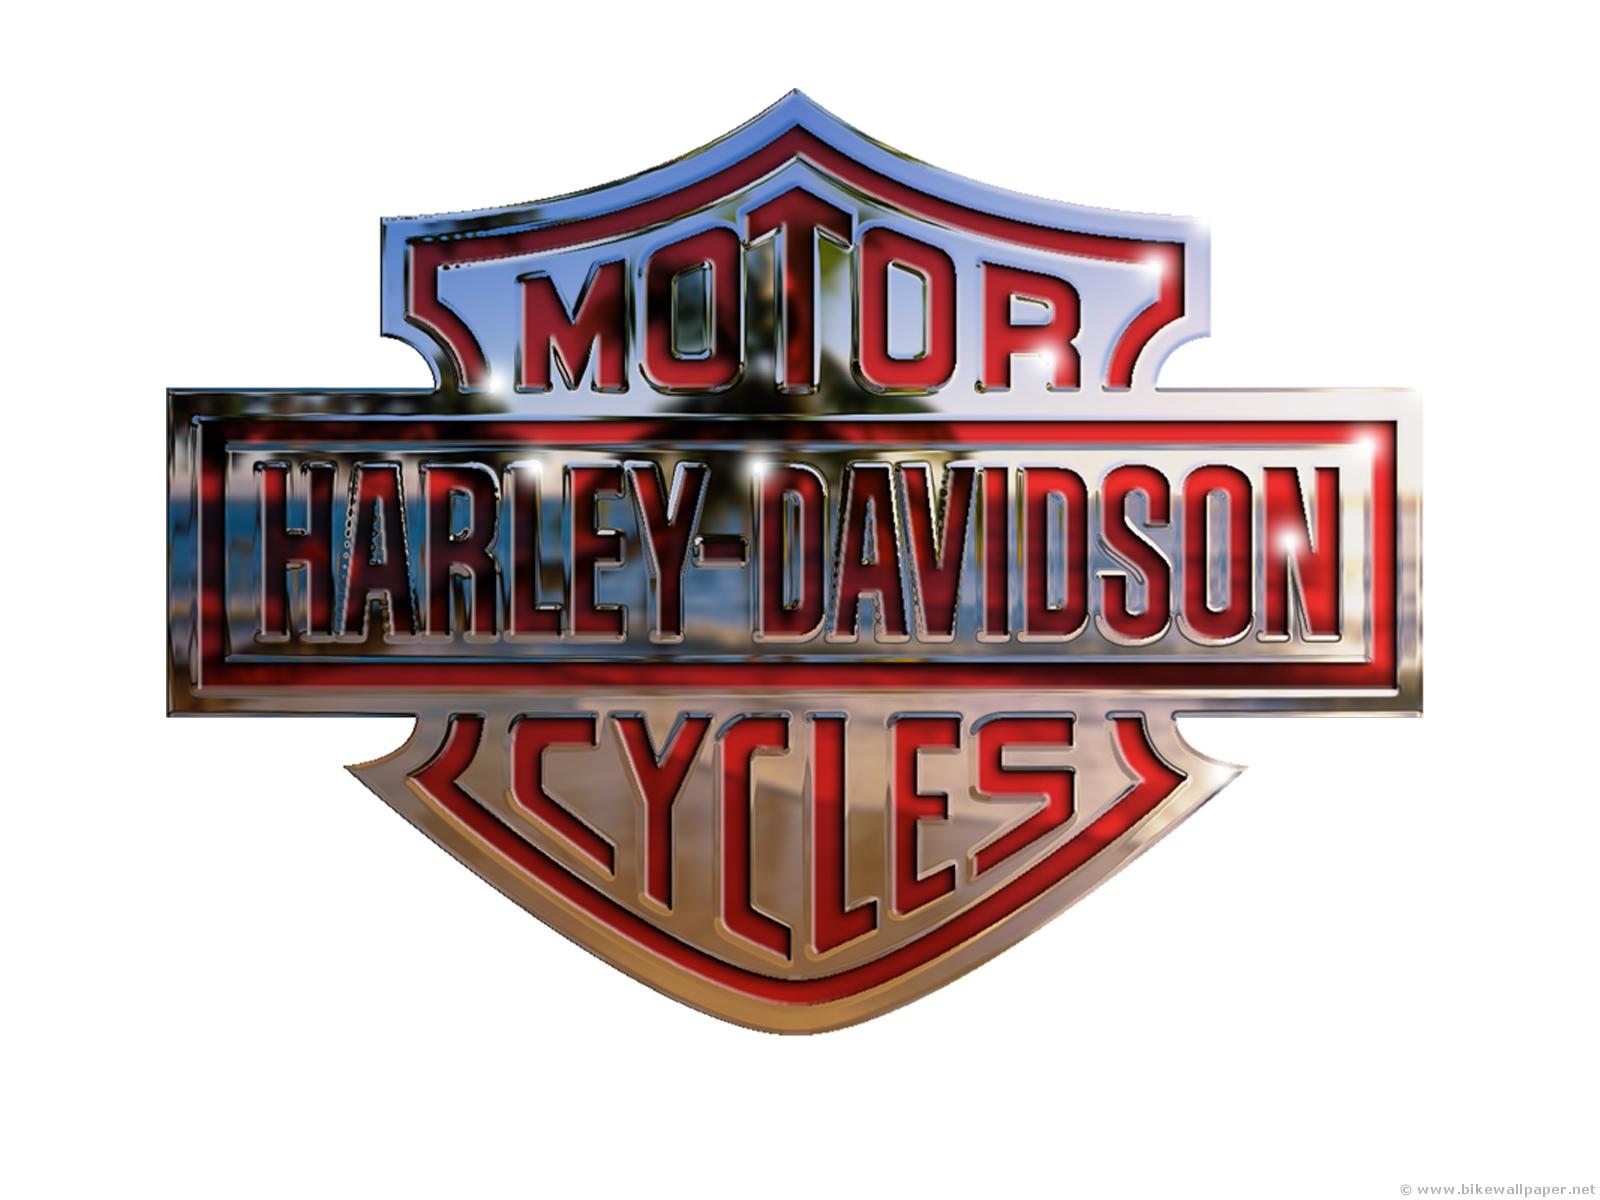 Harley Davidson Emblem: History Of All Logos: All Harley Davidson Logos